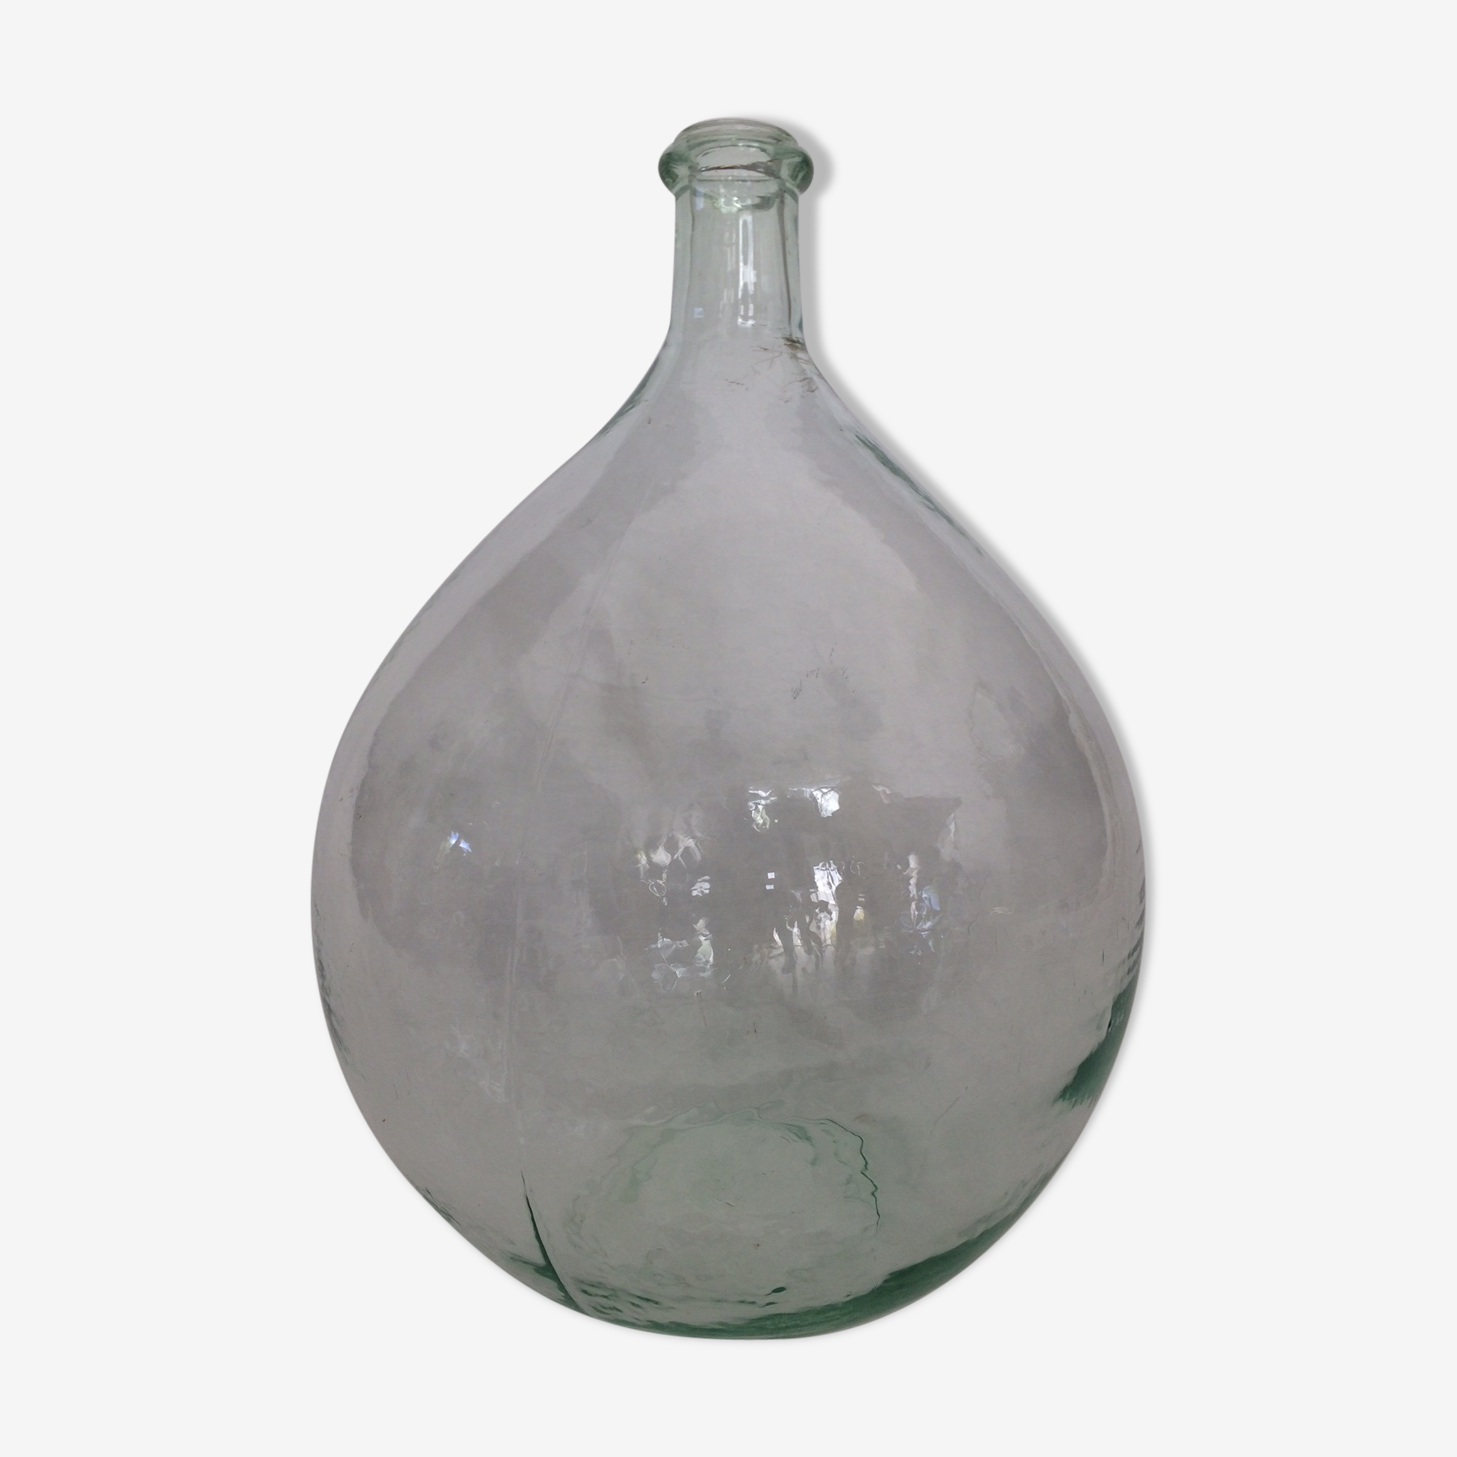 Transparent demijohn of 25l